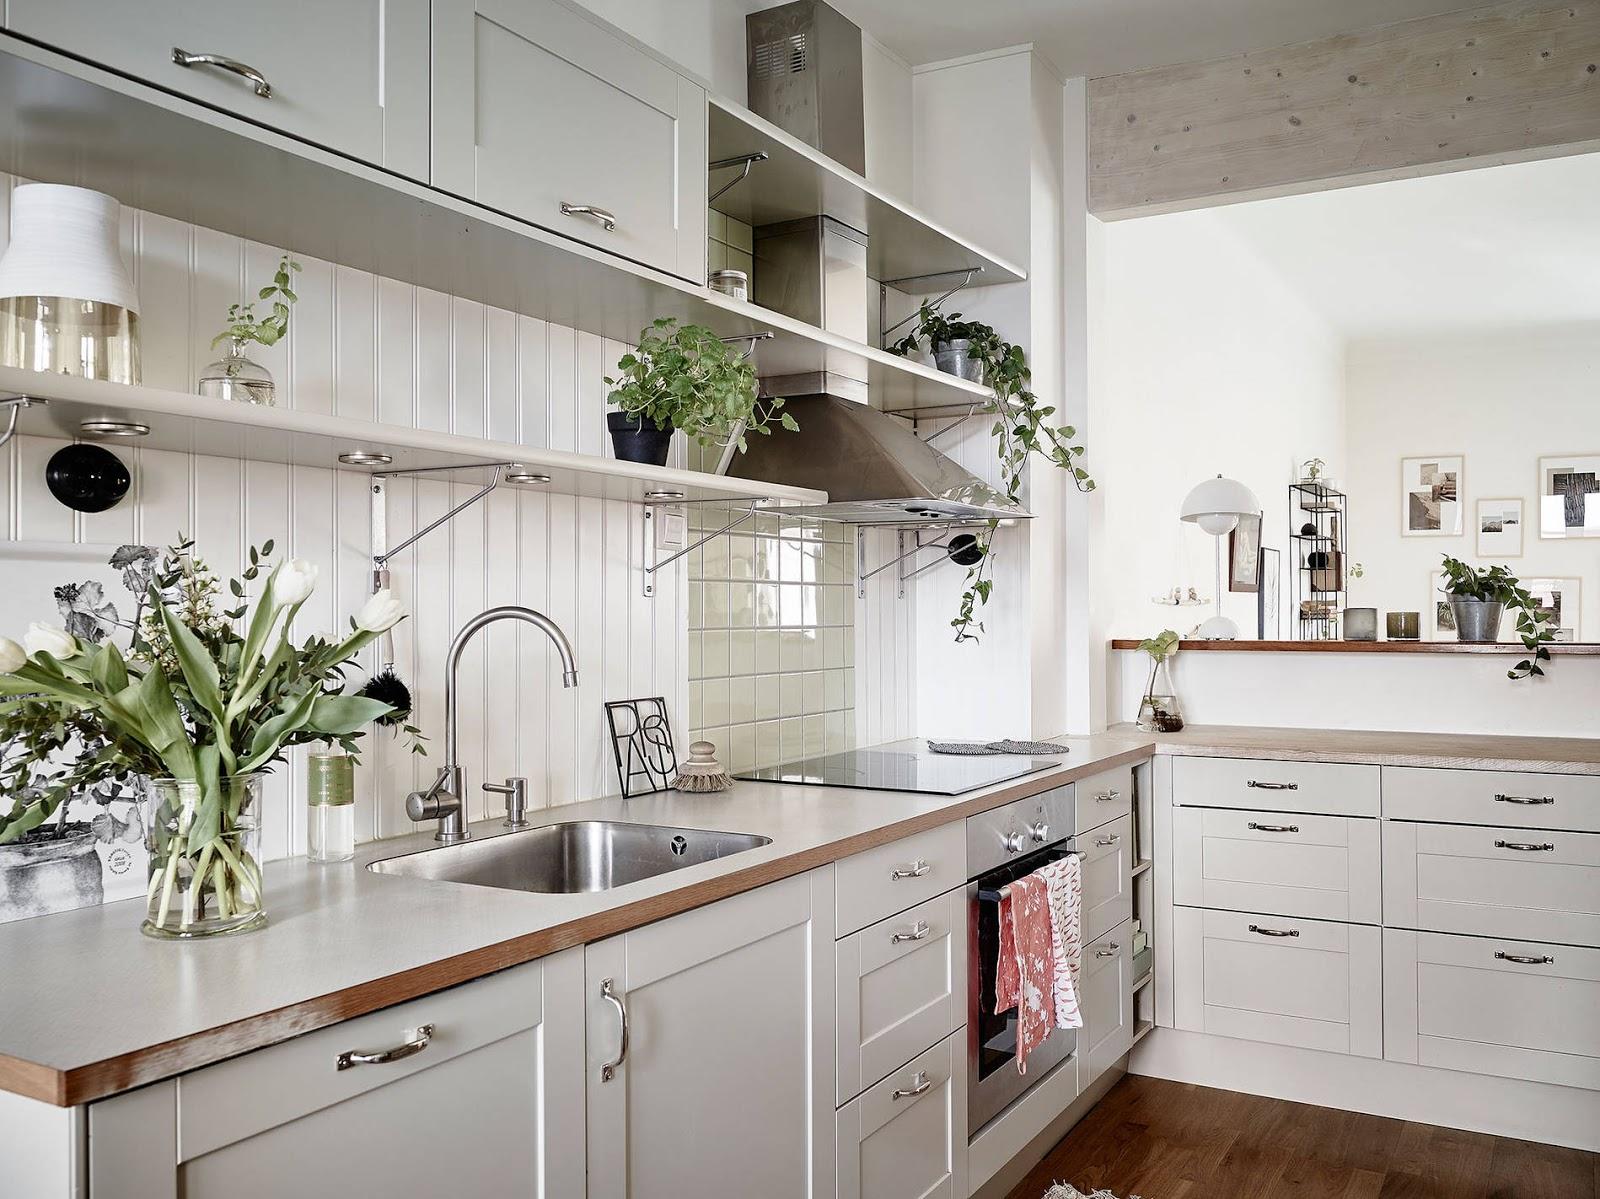 scandinavian kitchen, white kitchen, drewniany blat w kuchni